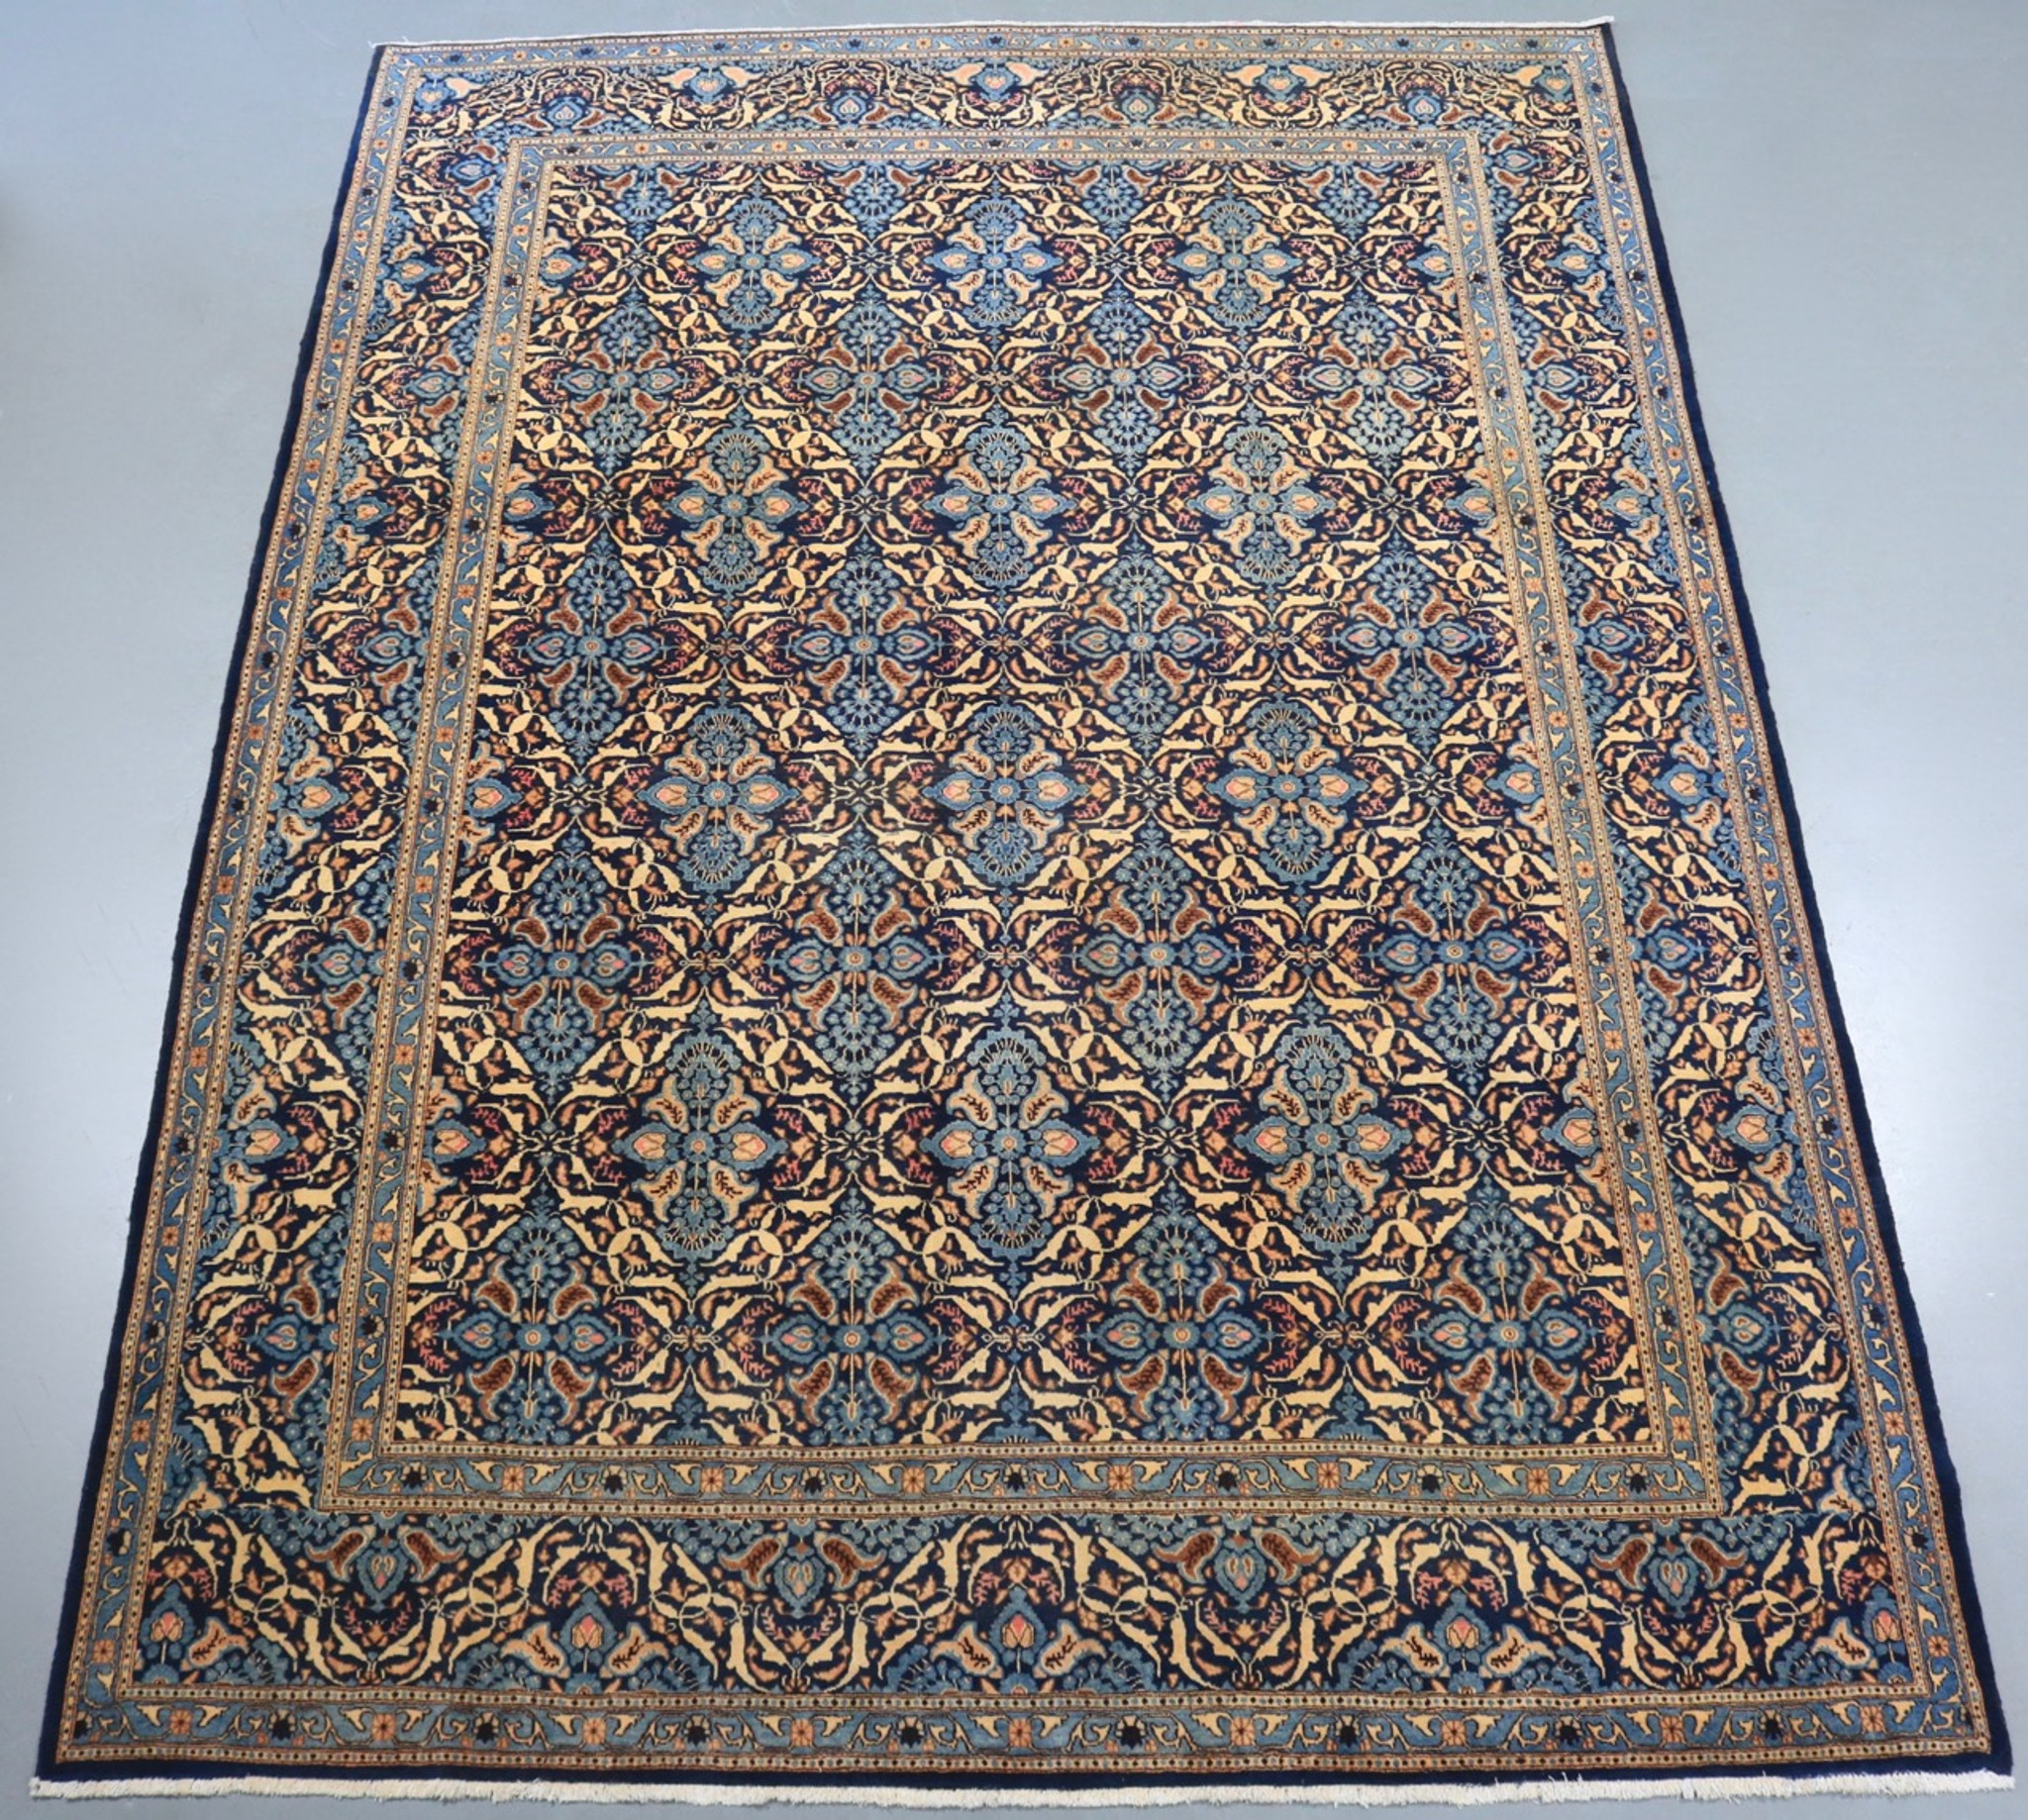 Persian Rugs Australia: Birjand Vintage Persian Rug (Ref 144) 406x300cm